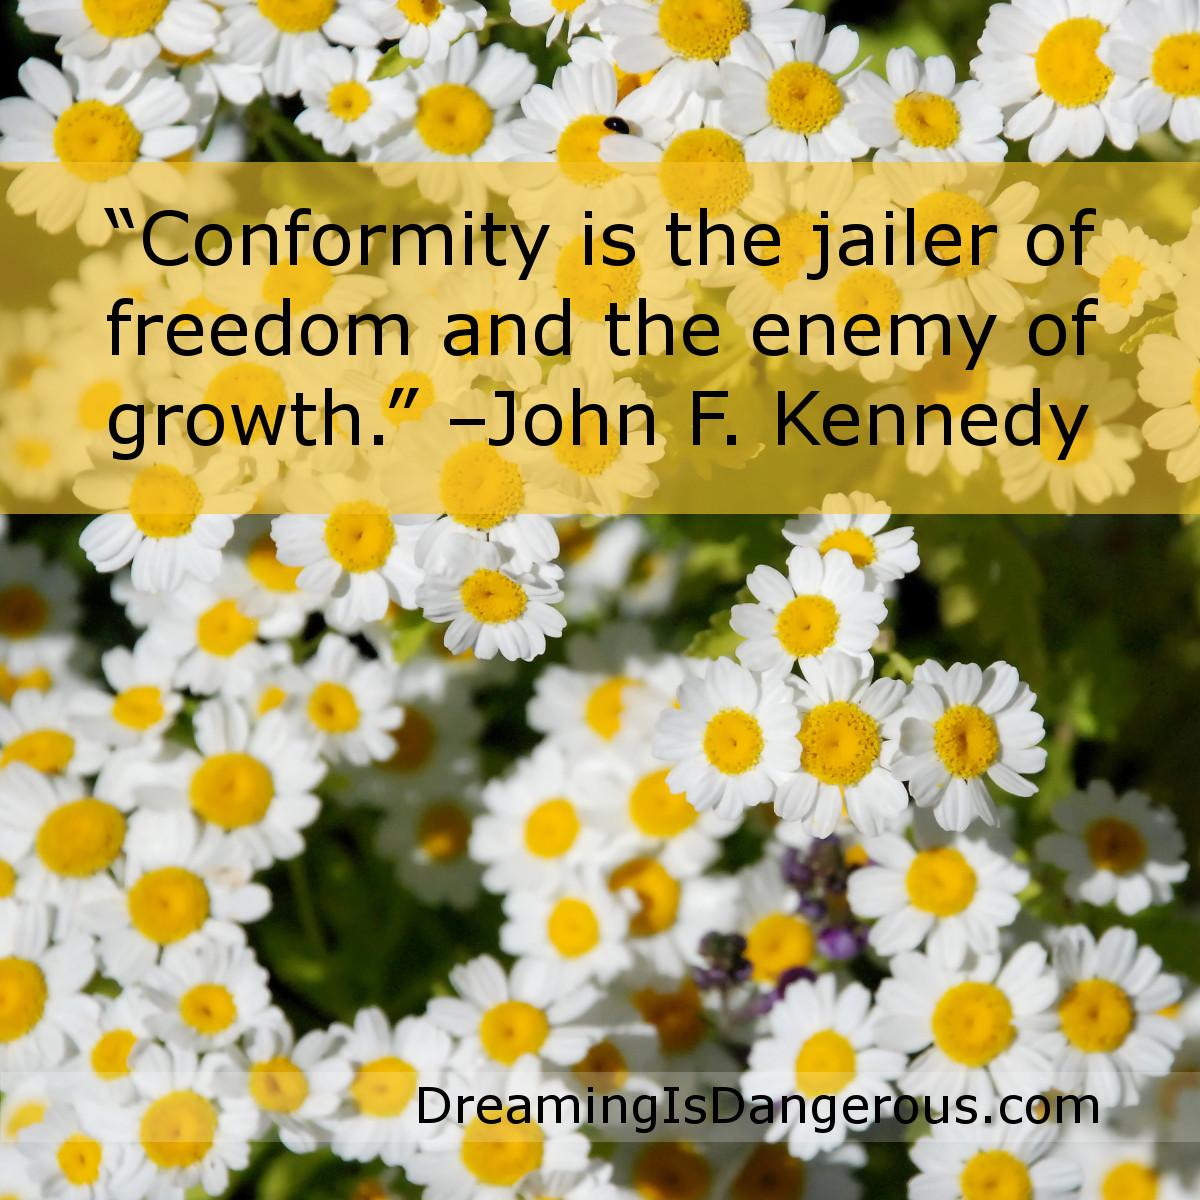 Dangerous Conformity